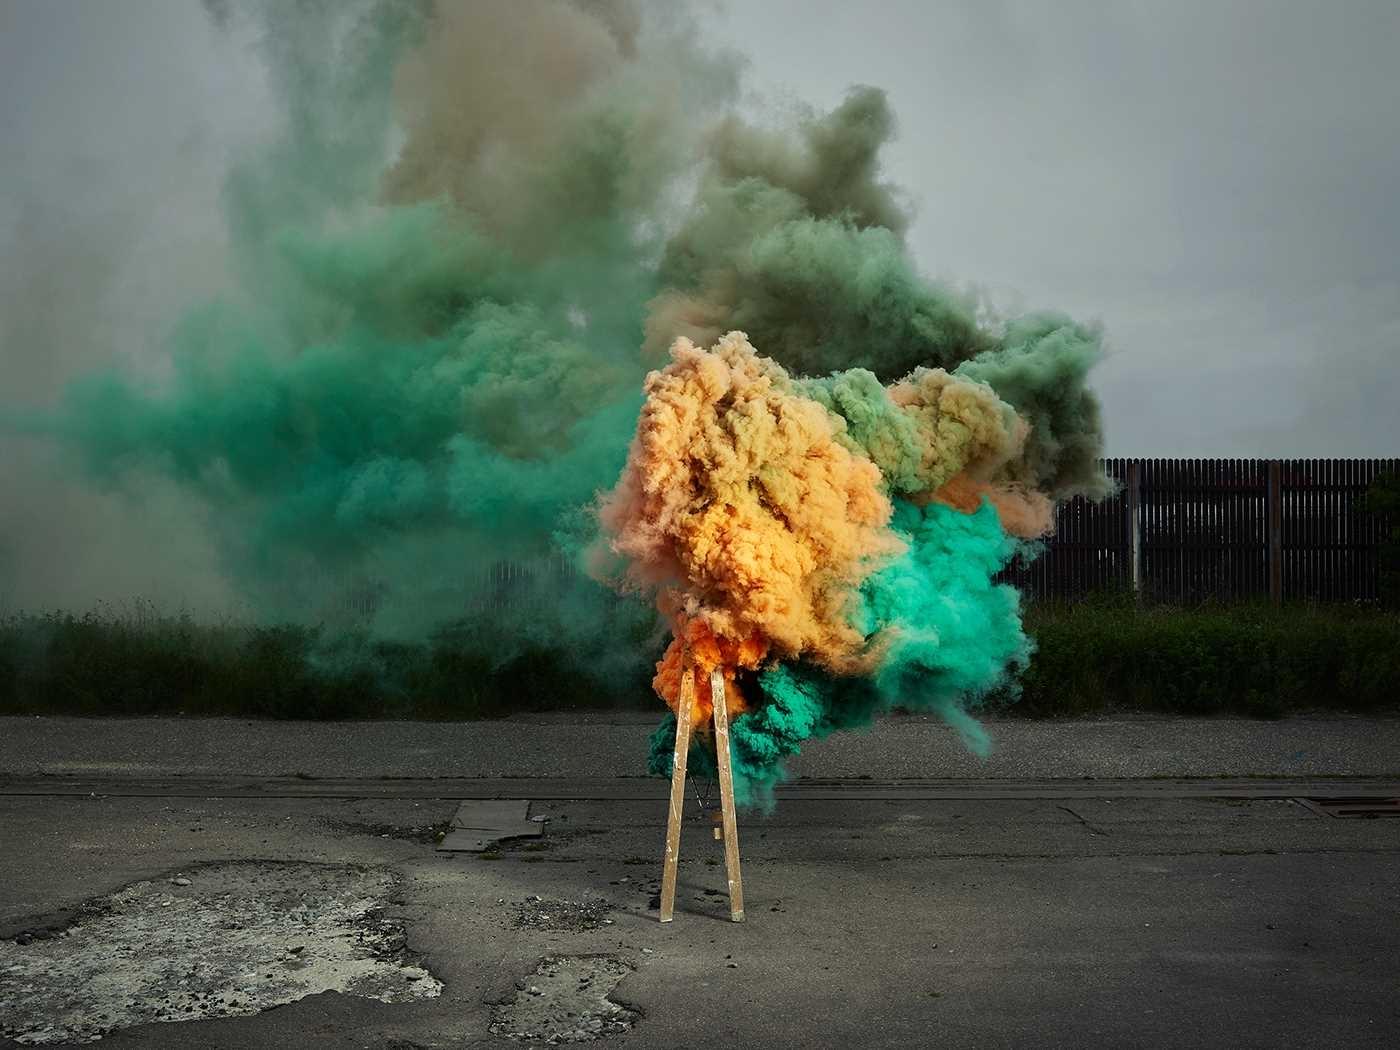 Smoke: Photography Ken Hermann - photogrist   ello